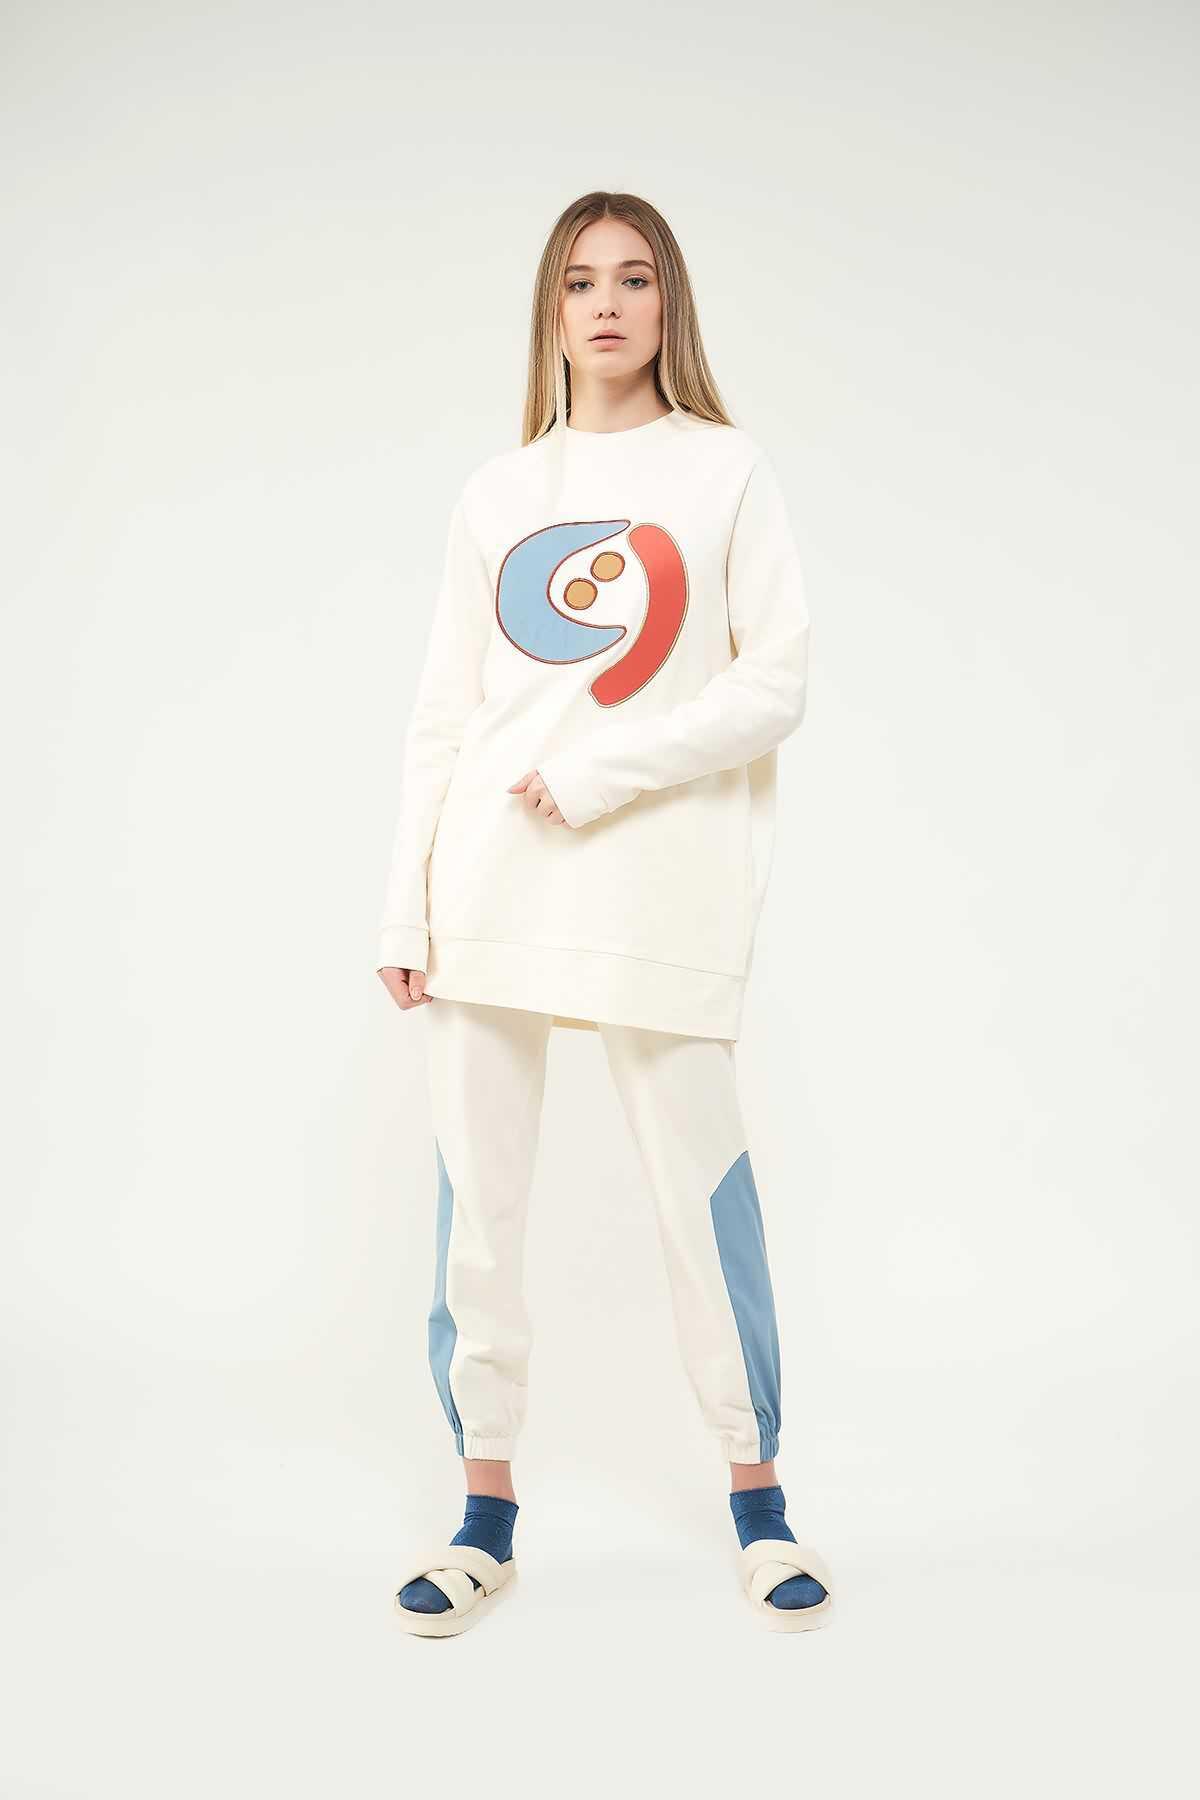 Mevra - Nakışlı Sweatshirt N2 Mavi